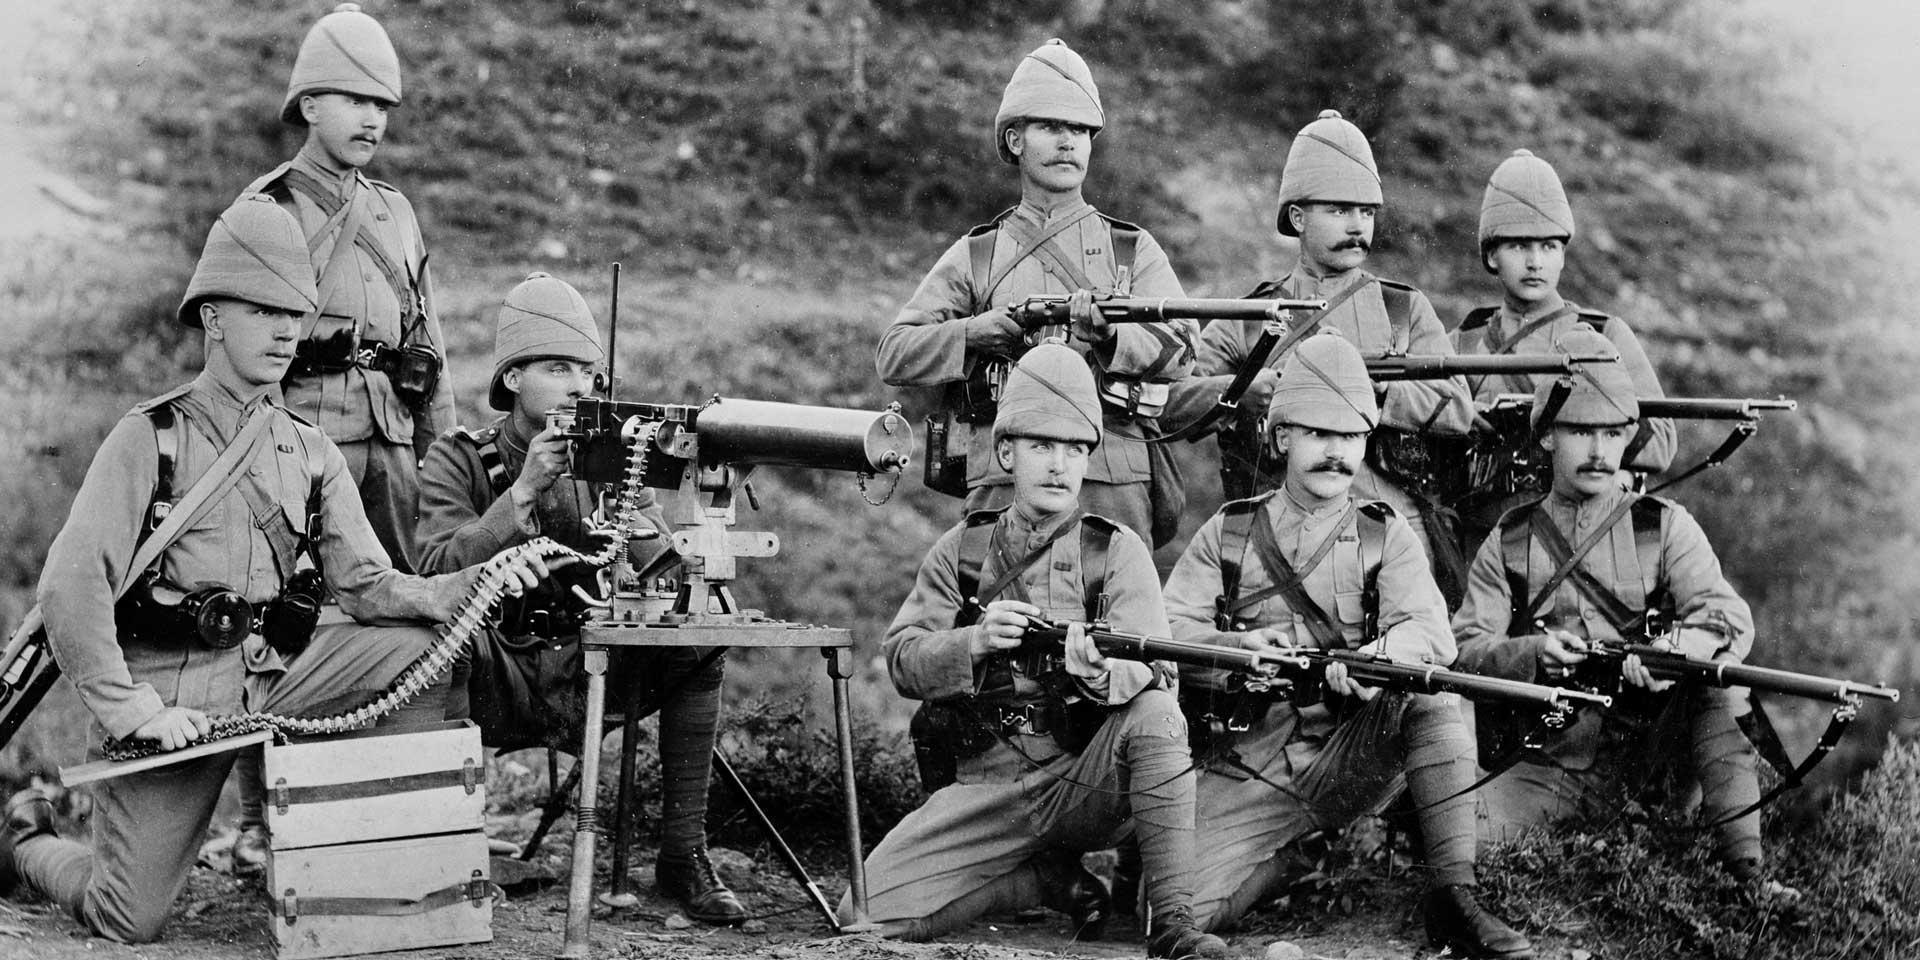 Maxim Gun detachment of 1st Battalion, King's Royal Rifle Corps, Chitral, 1895